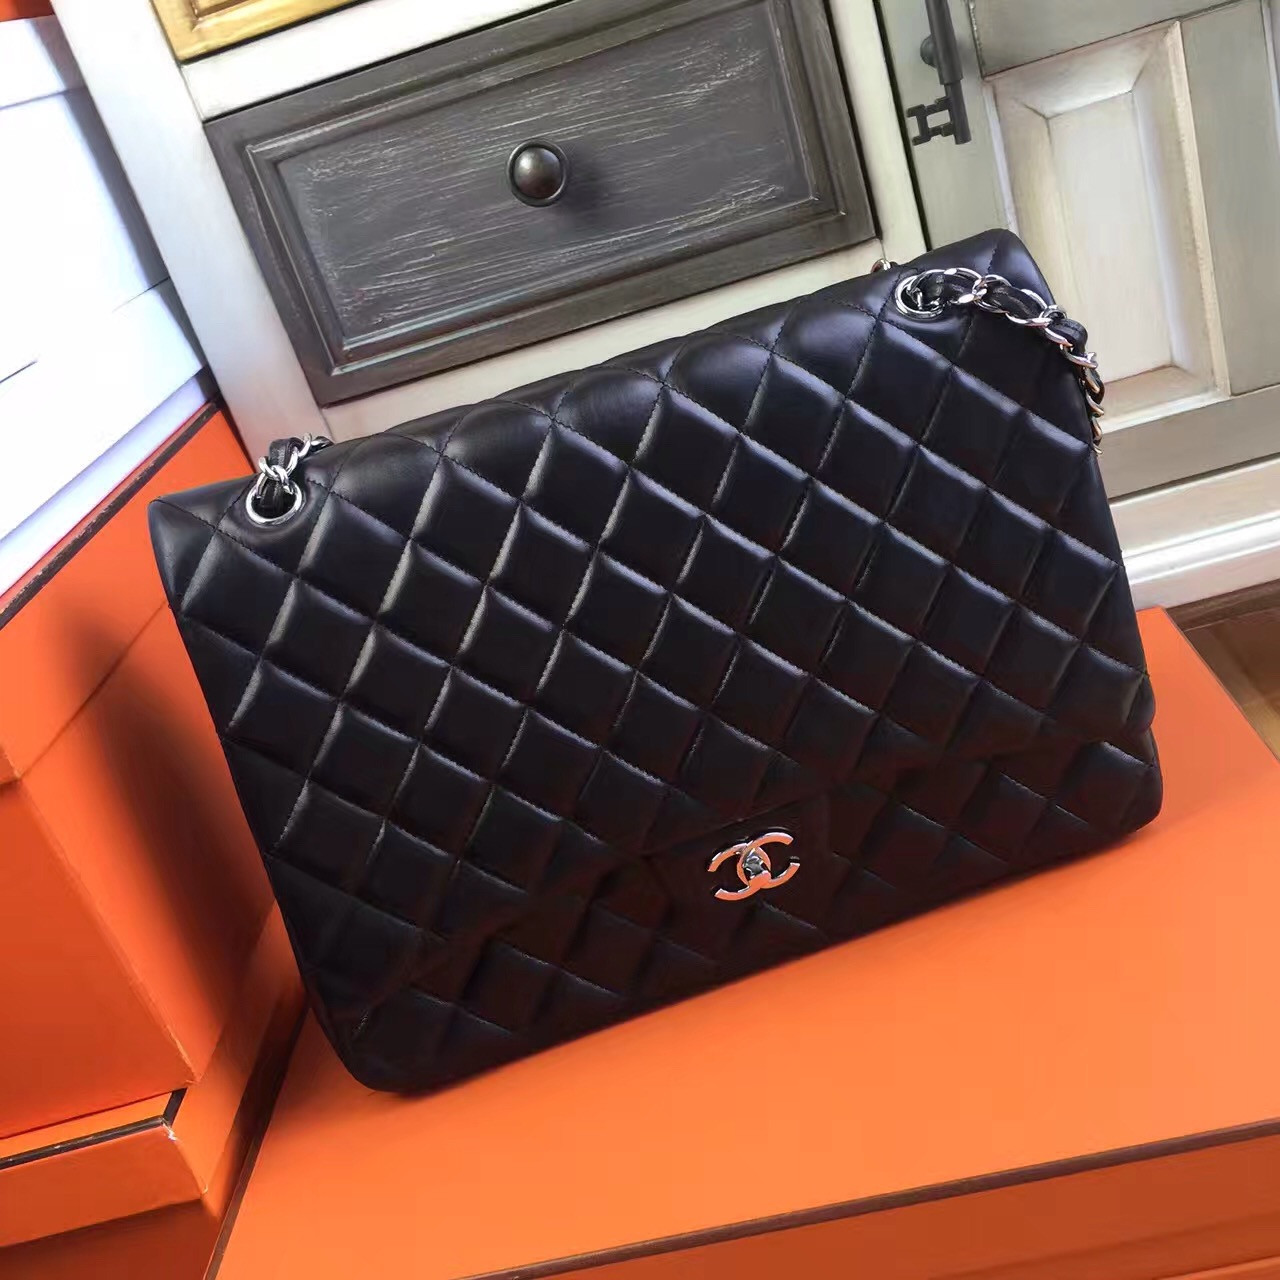 7ba3c99e6974 Chanel Black Quilted Lambskin Maxi Classic Double Flap Bag - Bella ...